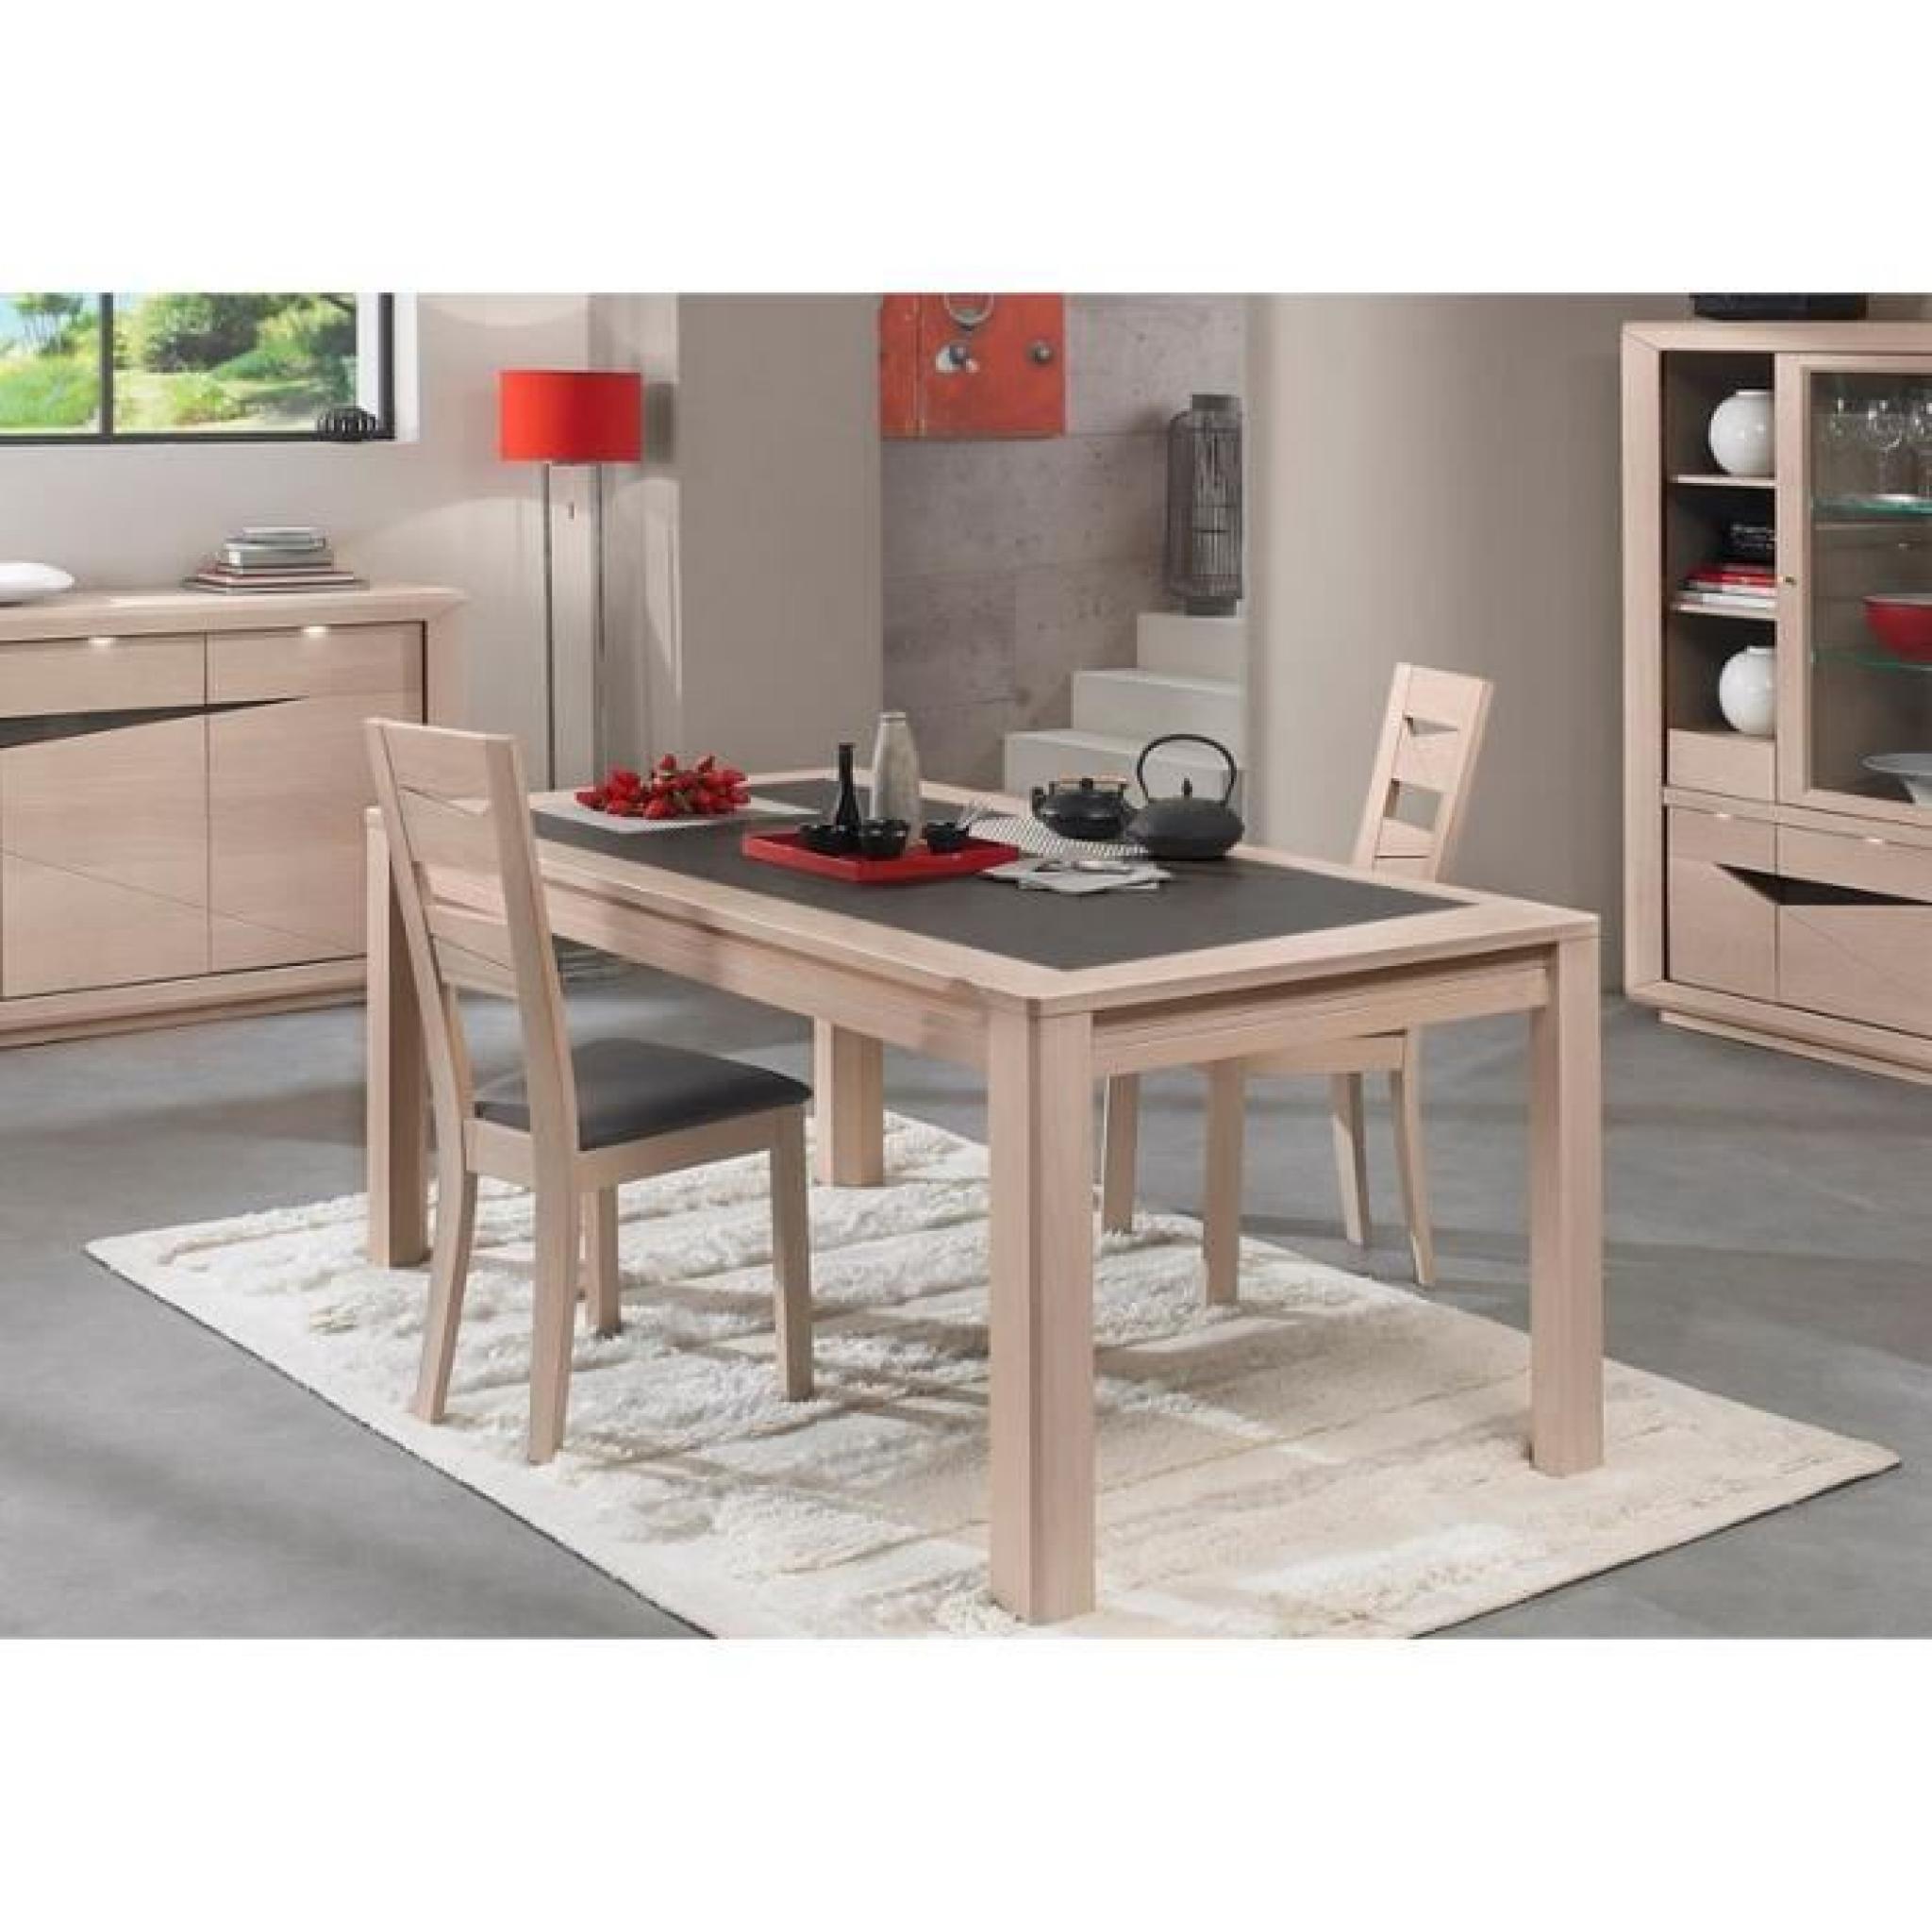 Table Ceramique Monaco Chene Blanchi L 160 X H 77 X P 90 Cannelle